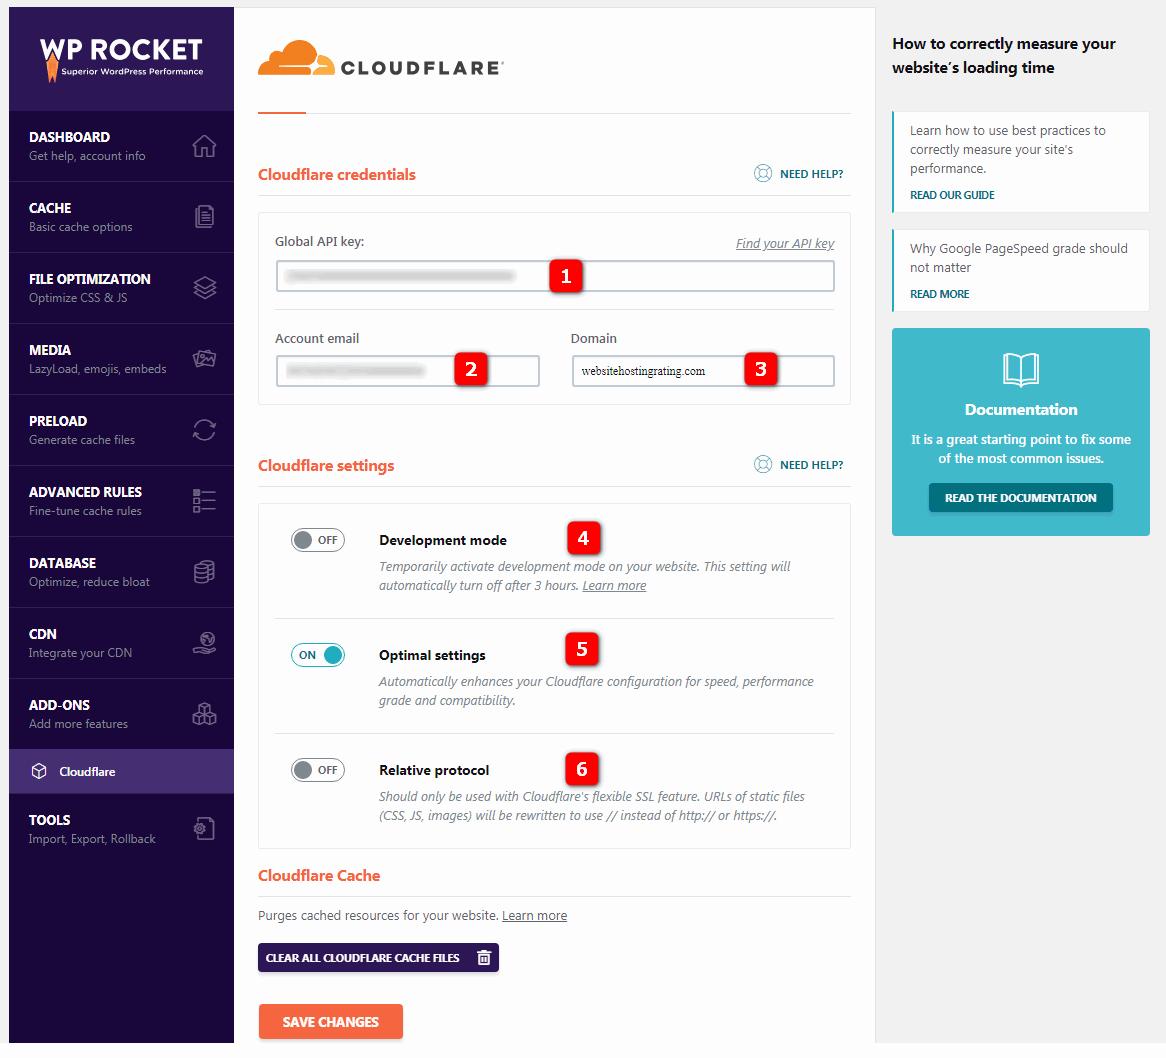 wp-rocket-cloudflare-settings-1